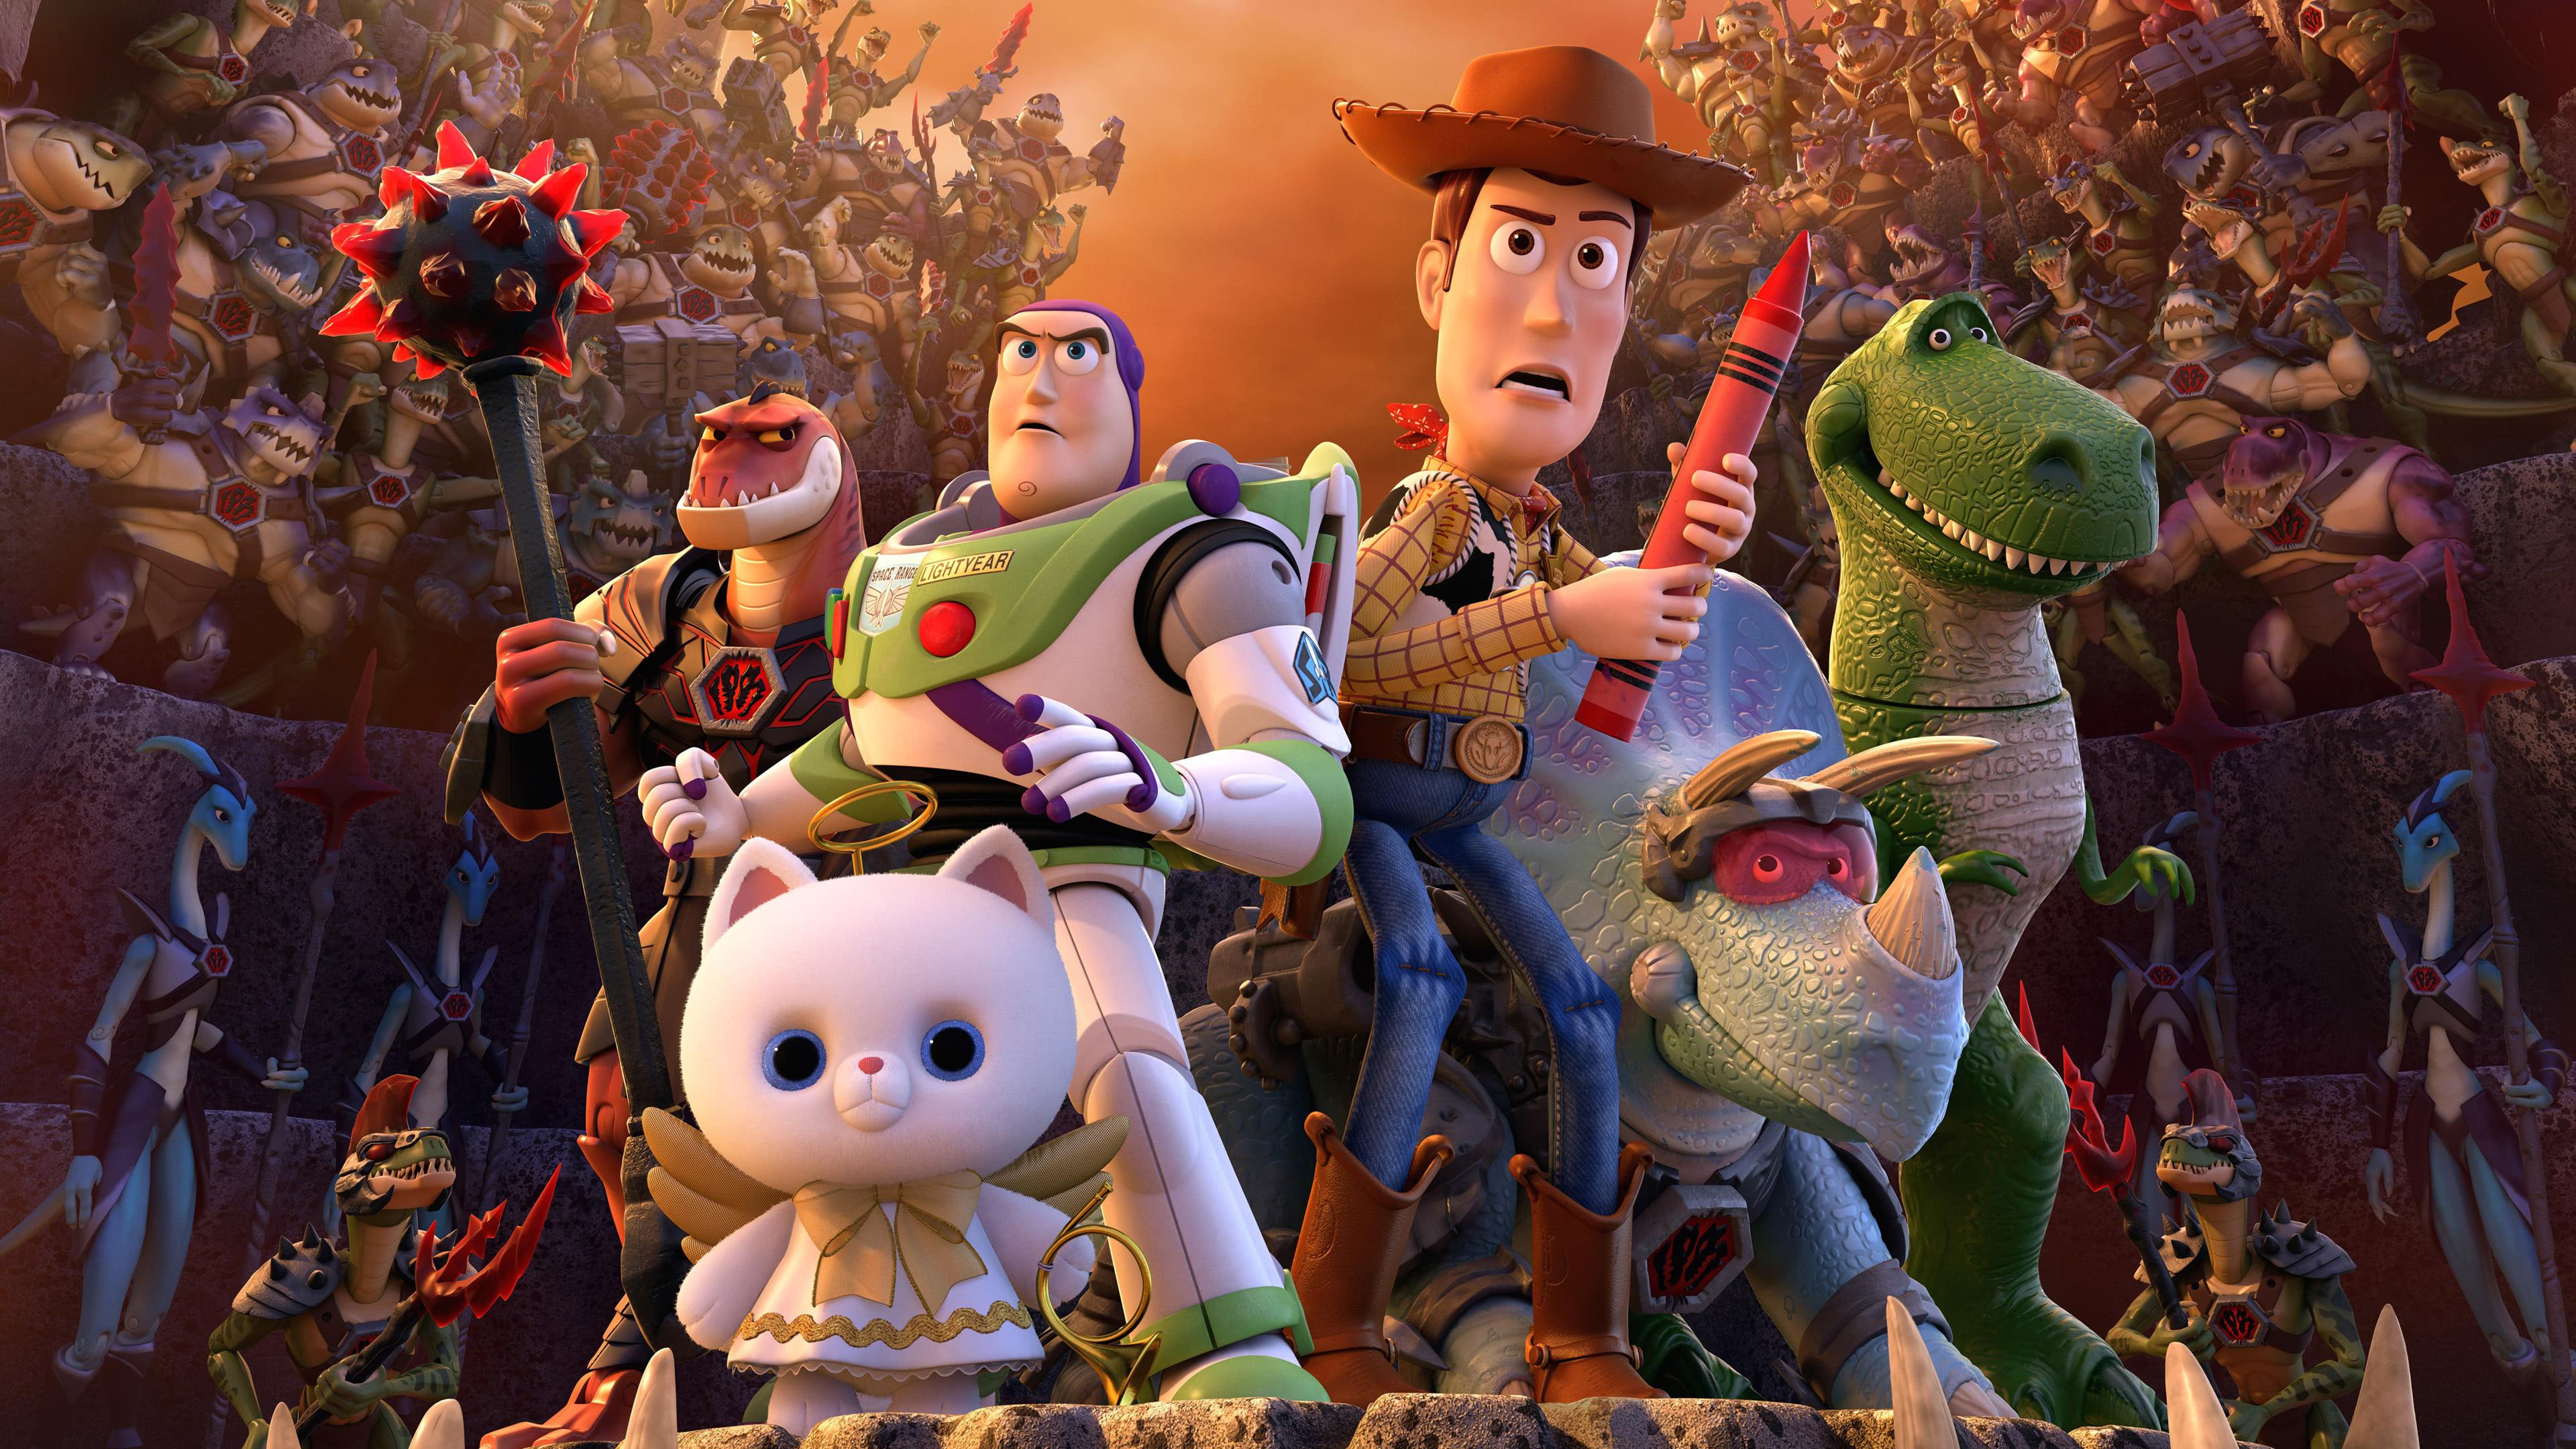 Toy Story 4 Characters UHD 4K Wallpaper Pixelz 3840x2160